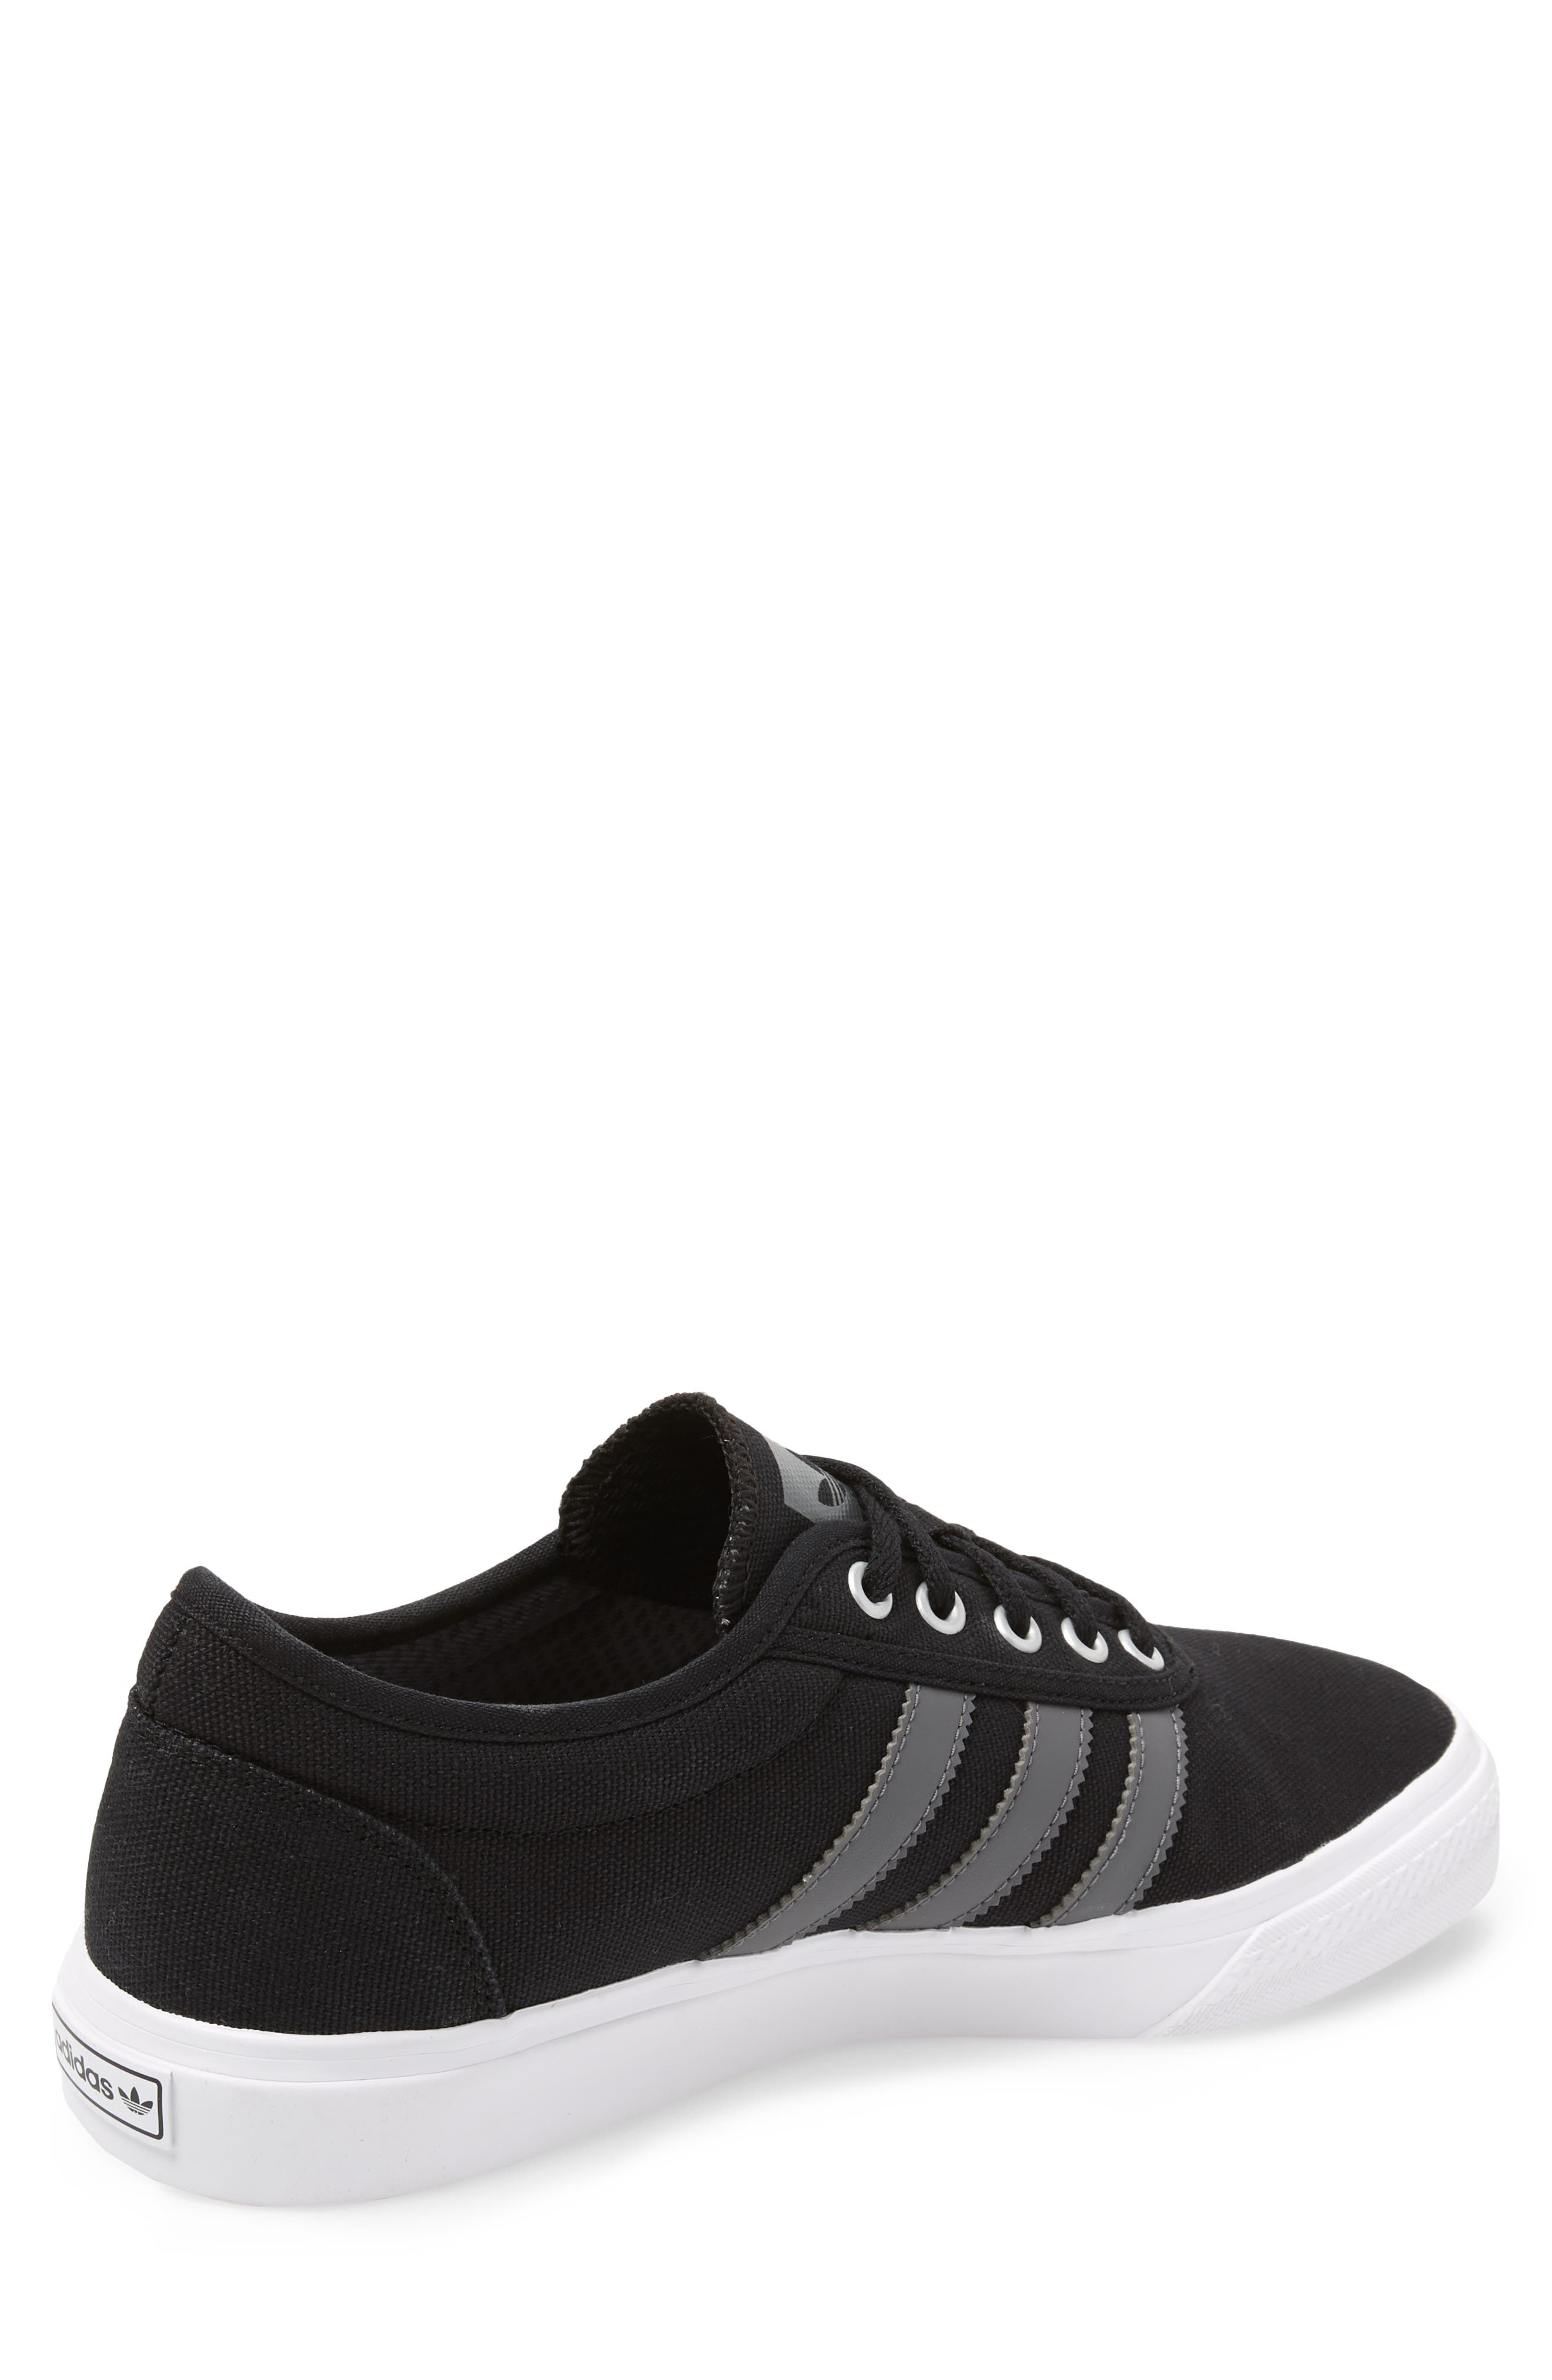 Adiease Skate Sneaker,                             Alternate thumbnail 2, color,                             001